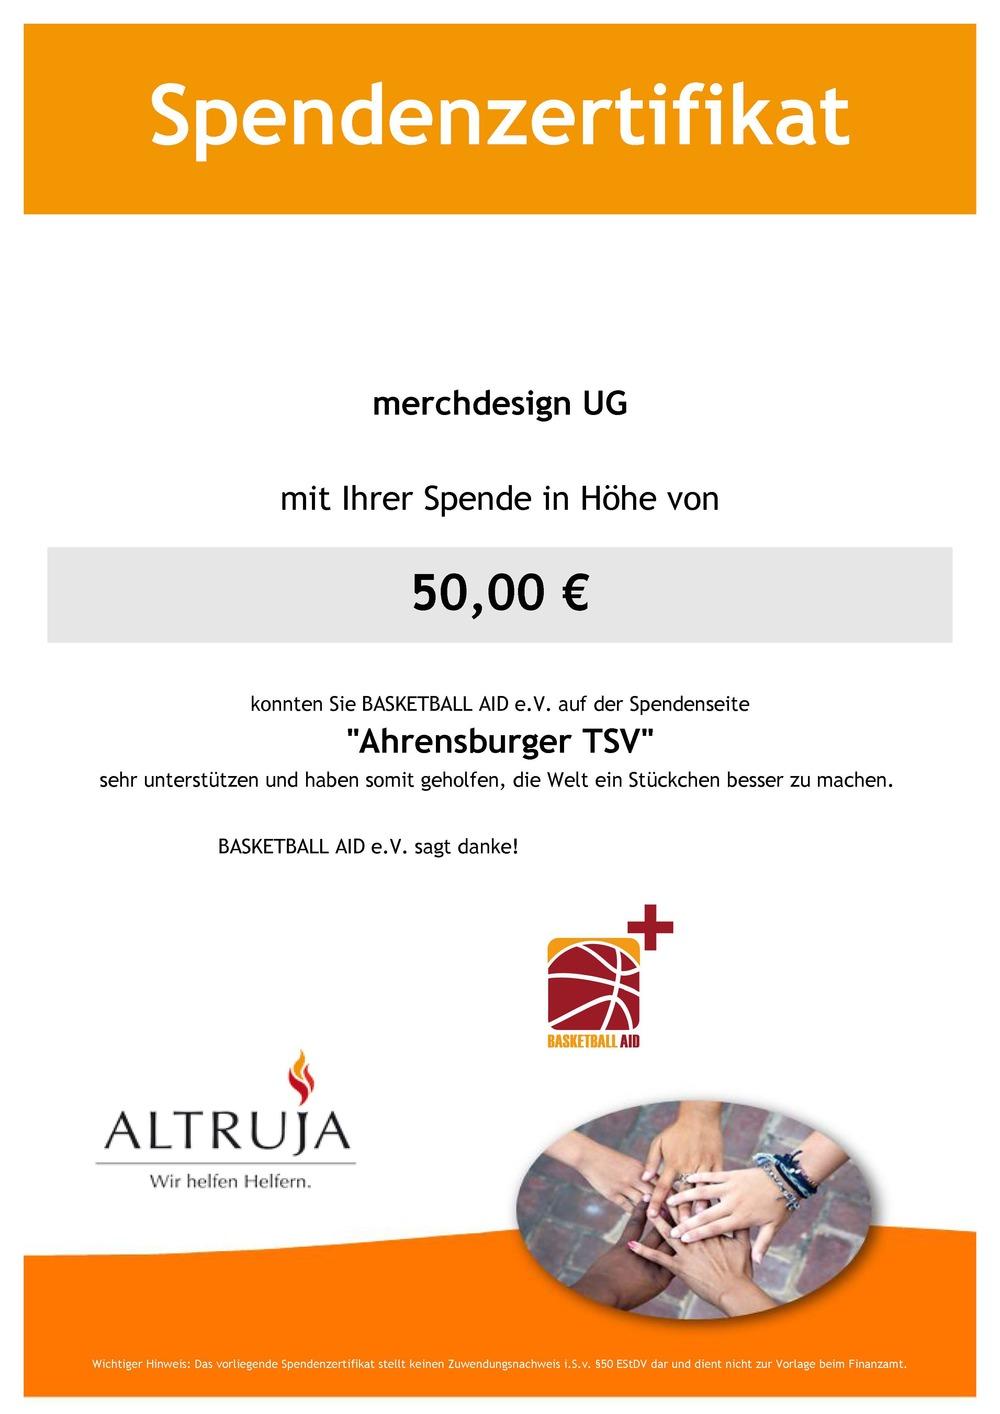 Spendenurkunde Basketball AID